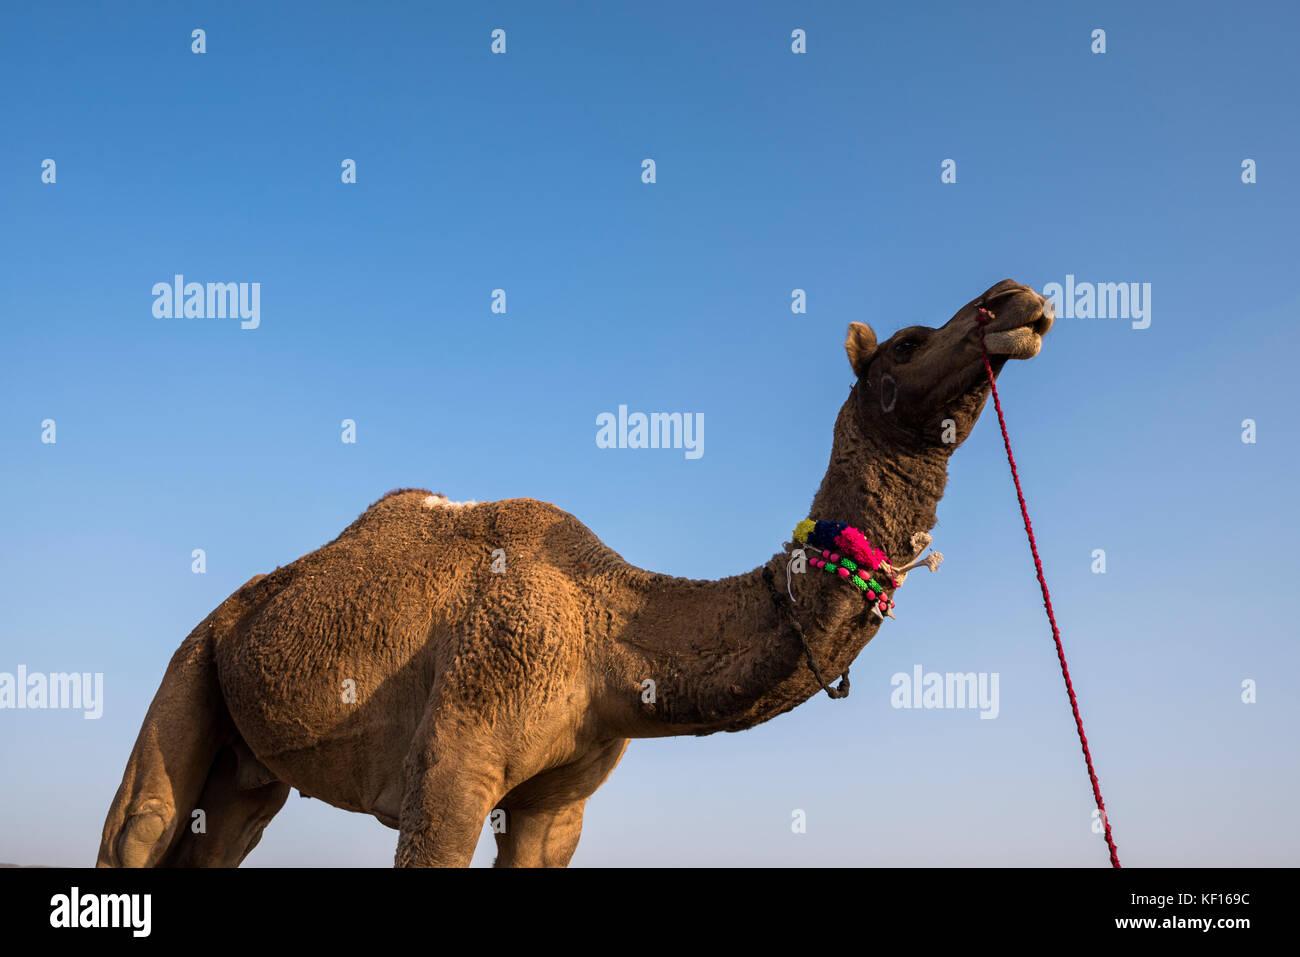 Pushkar, Indien. 24. Oktober, 2017. pushkar Camel fair. Porträt eines Kamels. Credit: ravikanth Kurma/alamy Stockbild